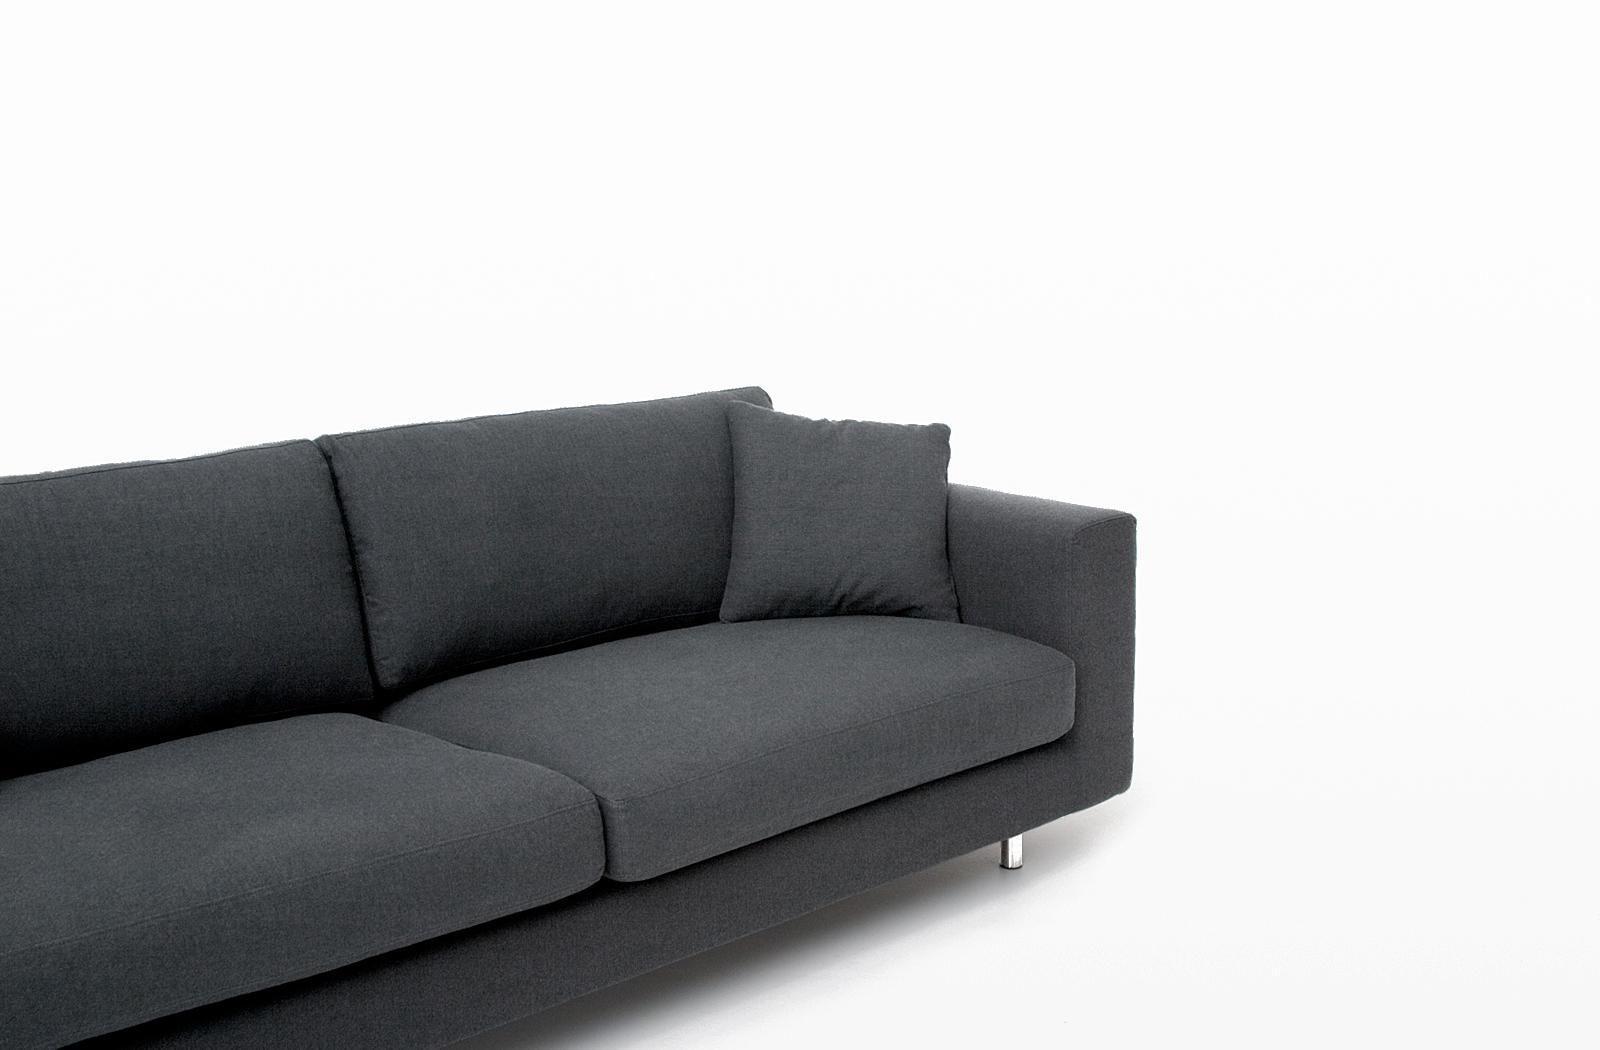 Contemporary Sofa / Fabric / 2 Seater / Black – Wide Arm – Bensen Throughout Bensen Sofas (Image 5 of 20)